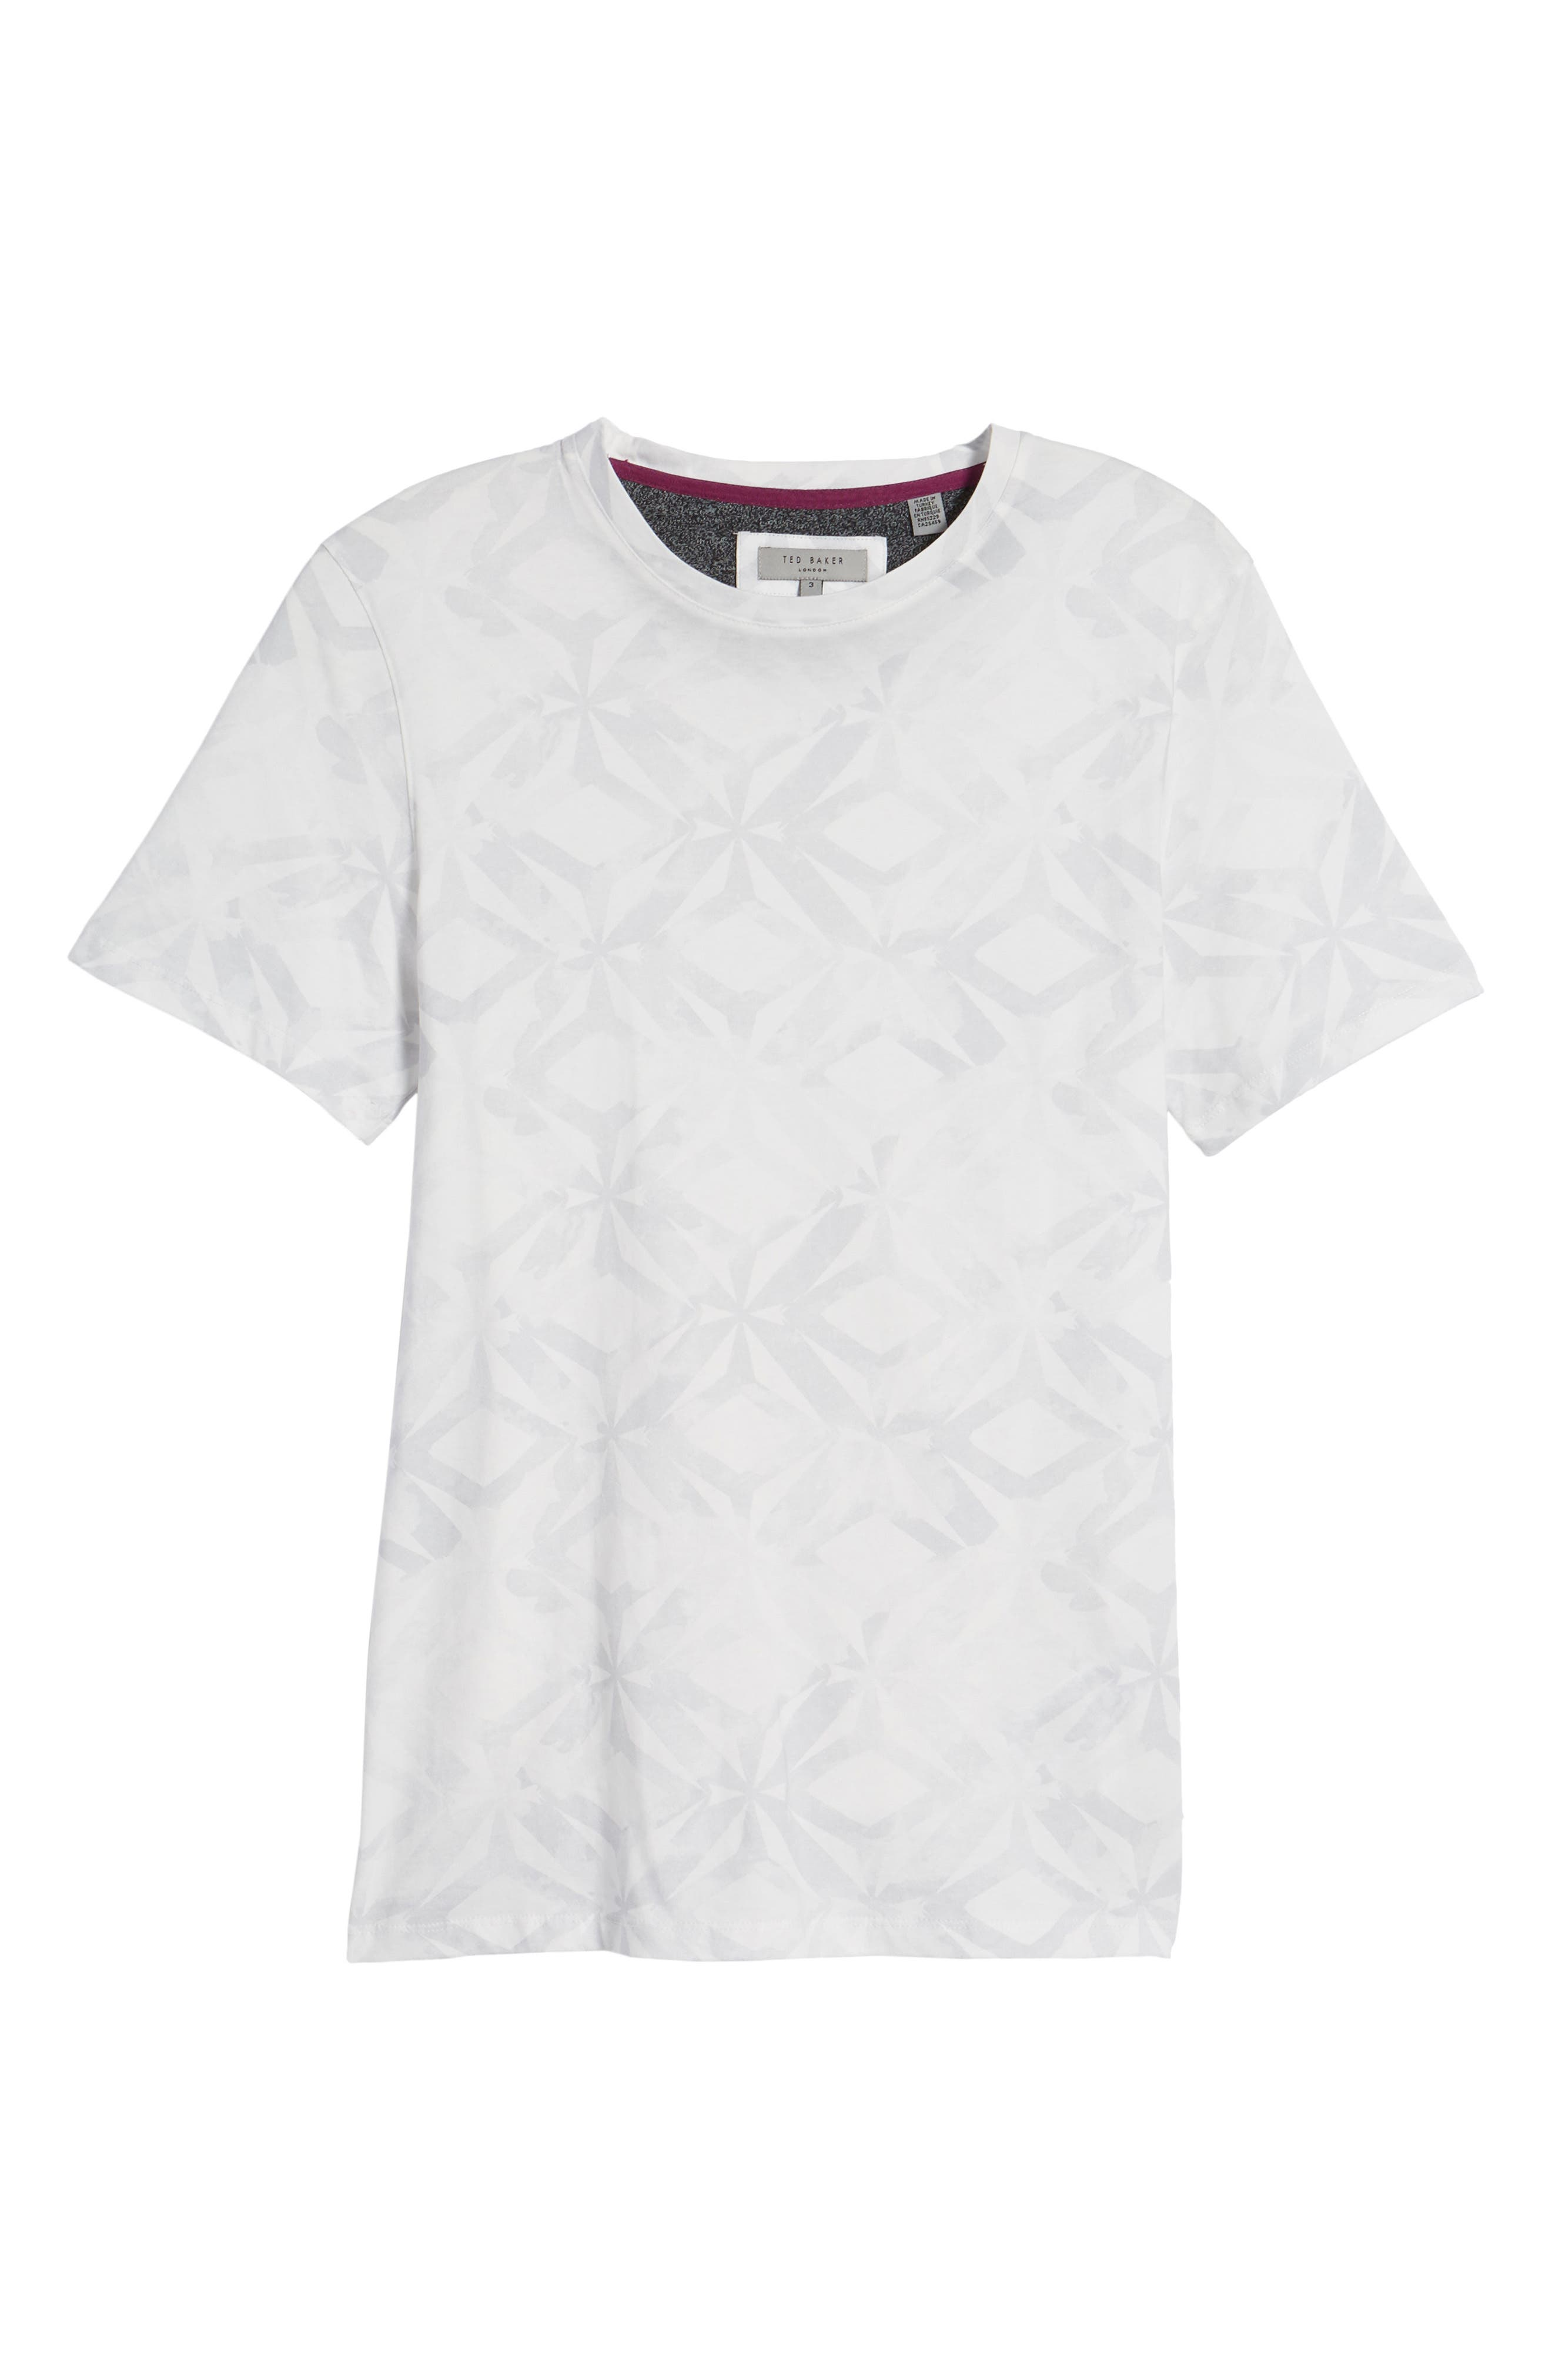 Woof Batik Print T-Shirt,                             Alternate thumbnail 6, color,                             110